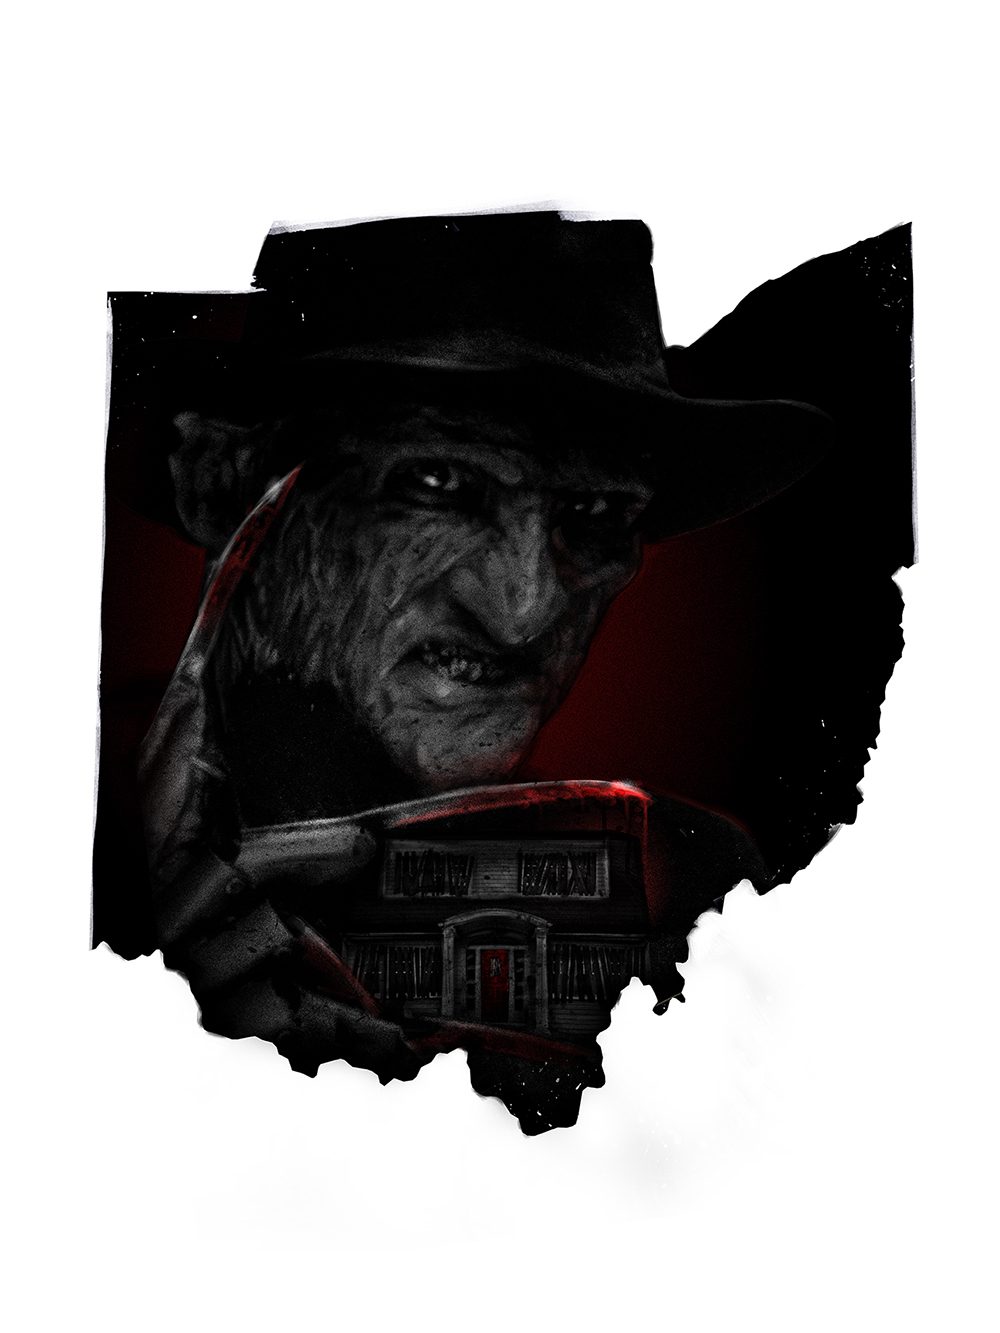 United States of Horror: Ohio